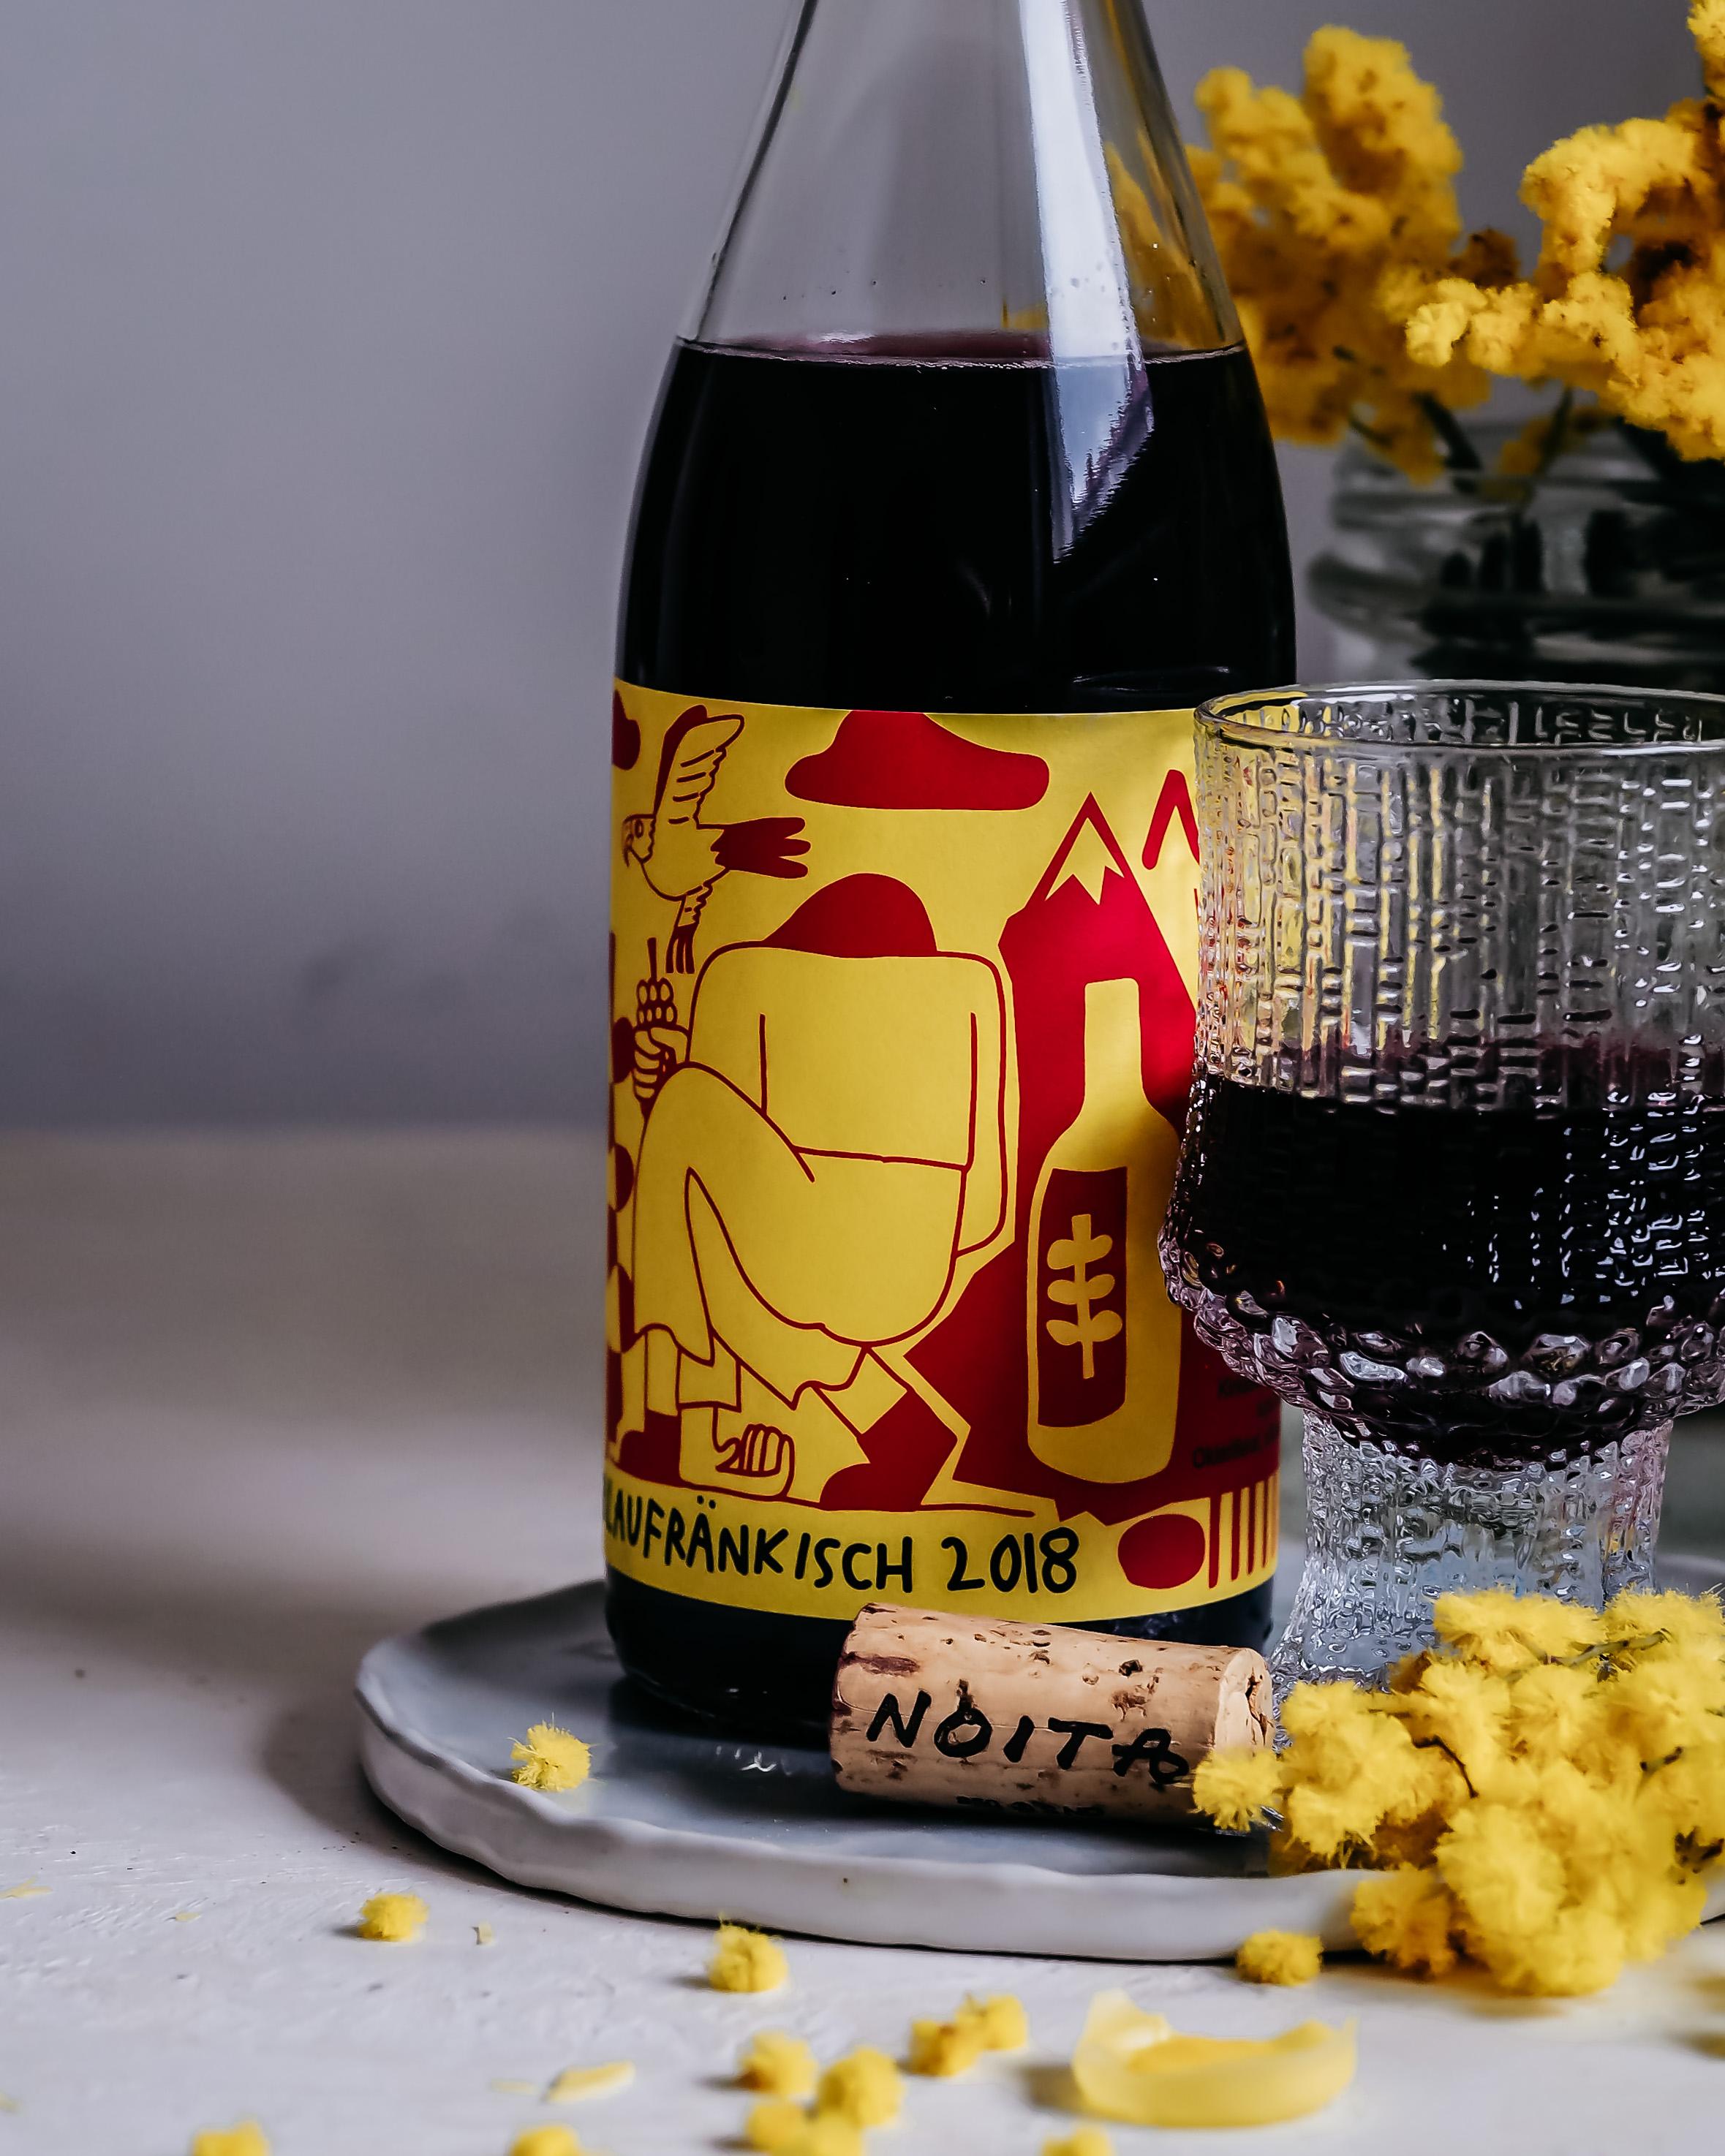 noita winery